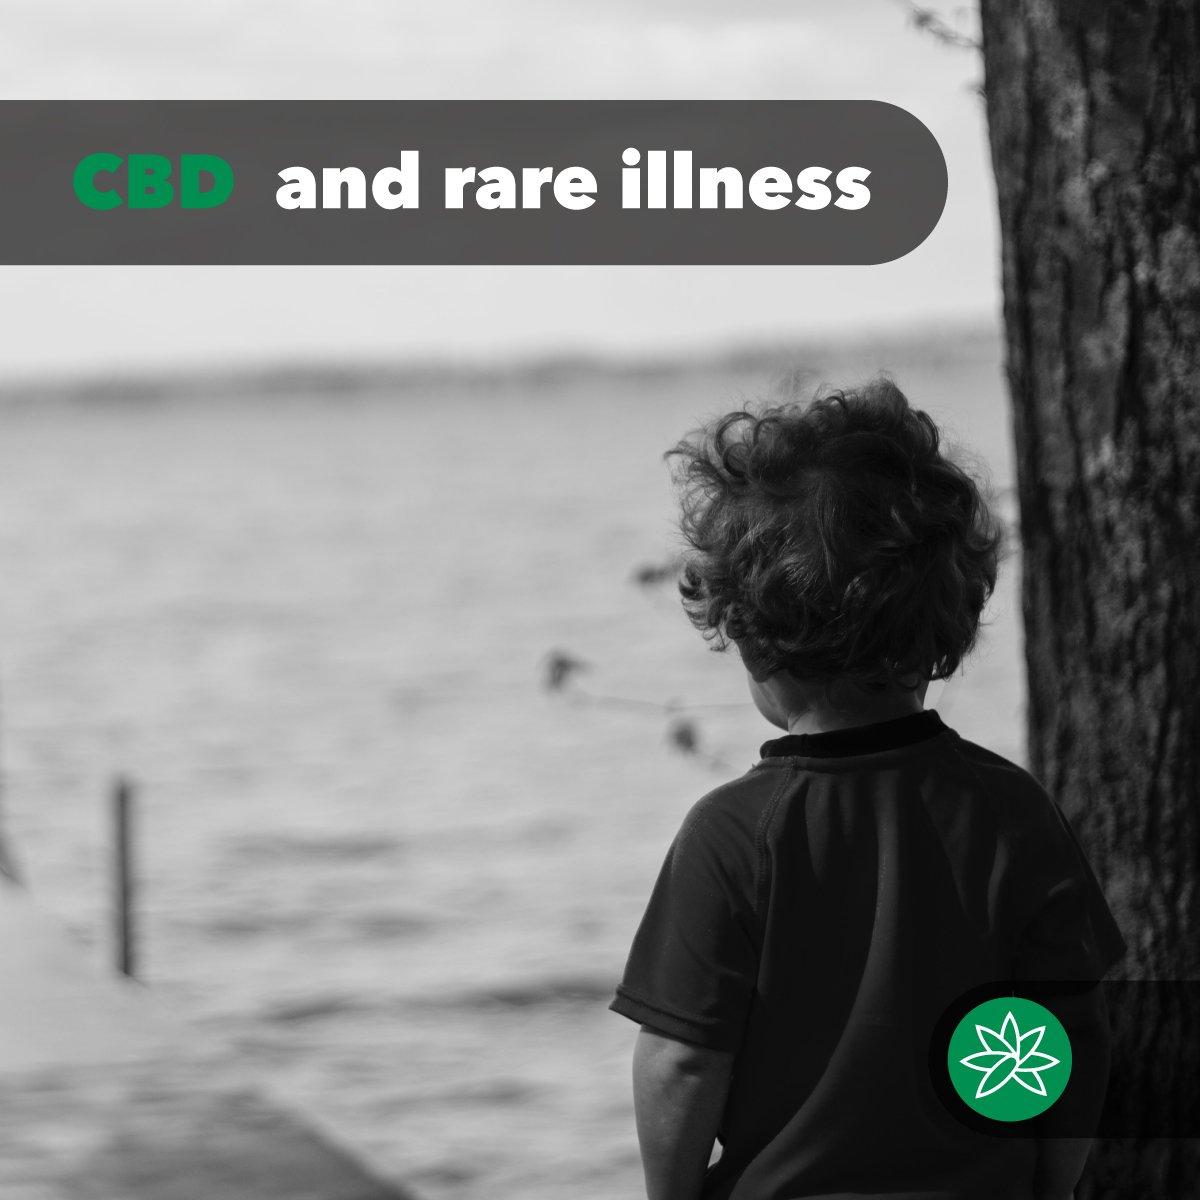 CBD and rare illness